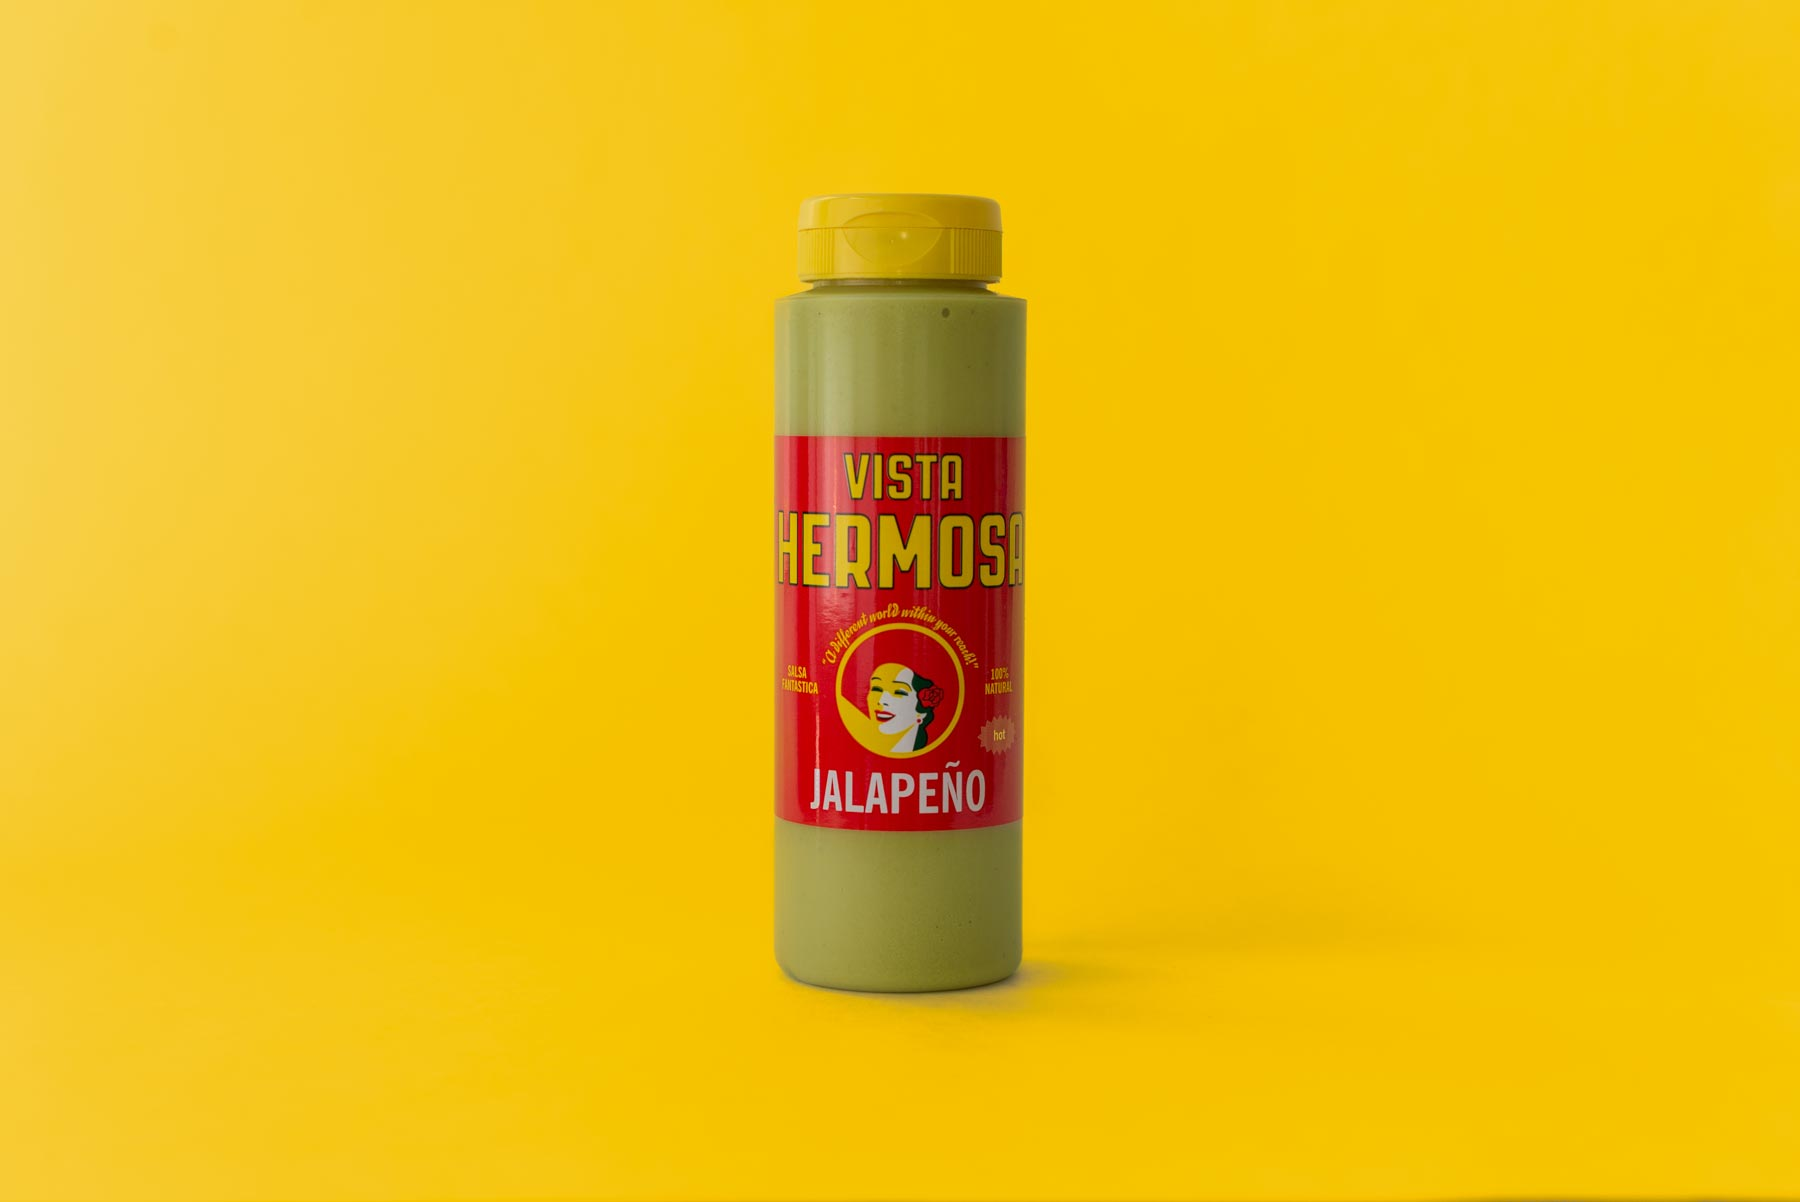 Jalapeño - A creamy, mild salsa full of mild jalapeño flavor.